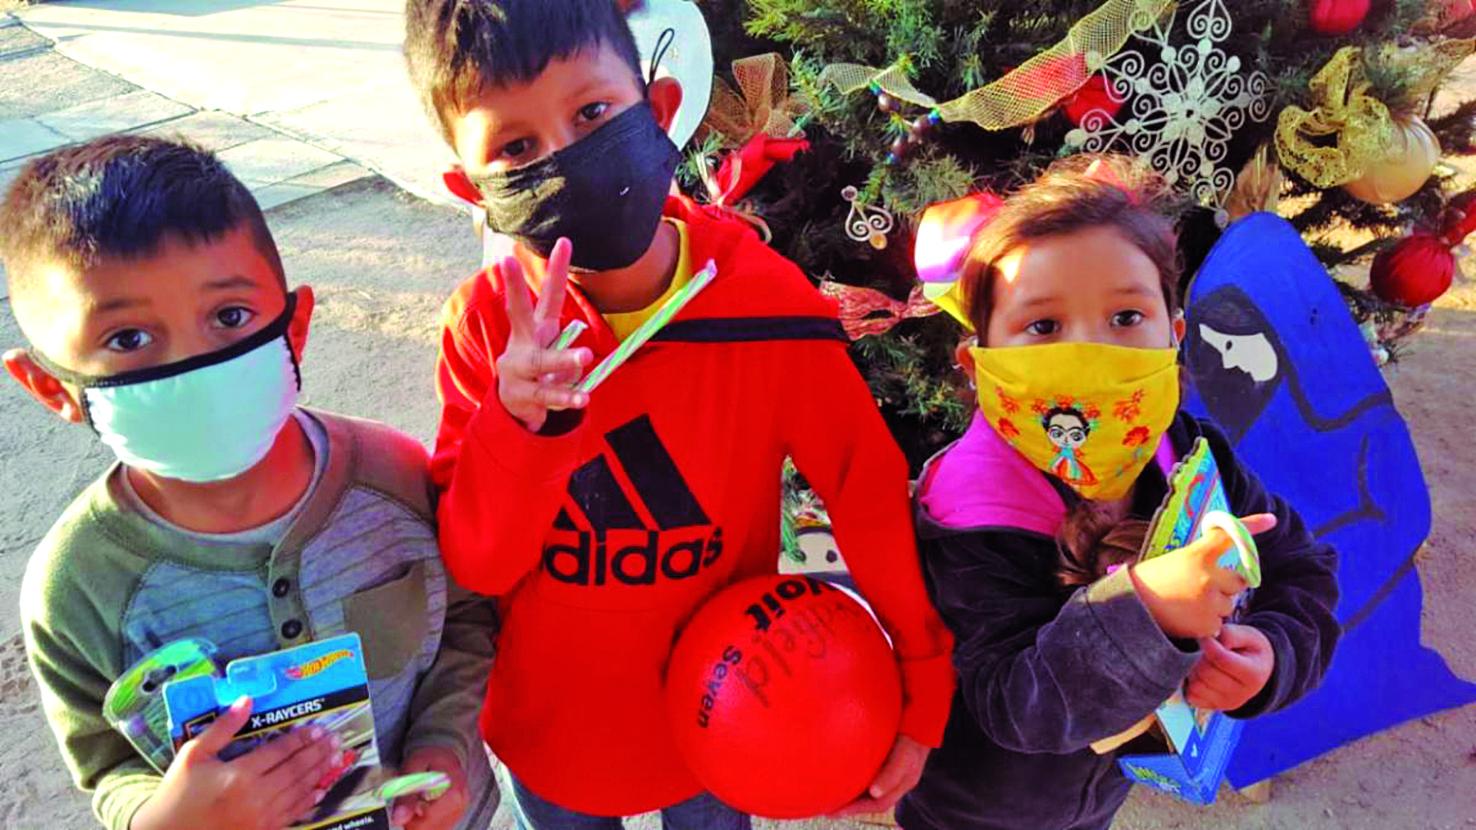 La Esperanza Community Center – An Unsung Hero Helping Those in Need